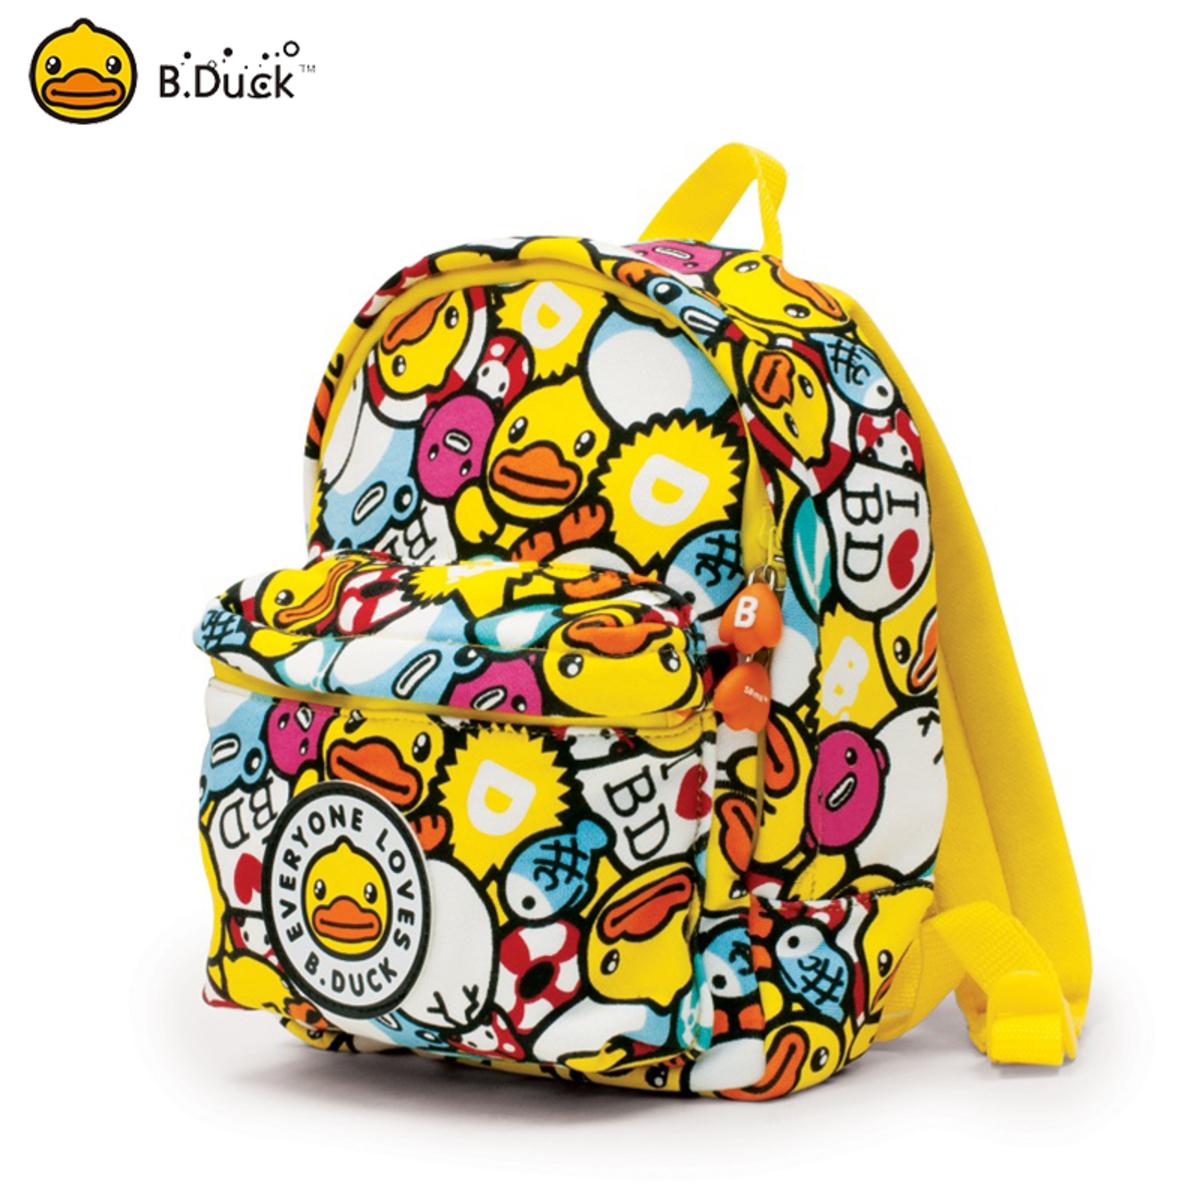 B.Duck 鴨仔兒童花紋背囊(鴨仔朋友)Kids Backpack